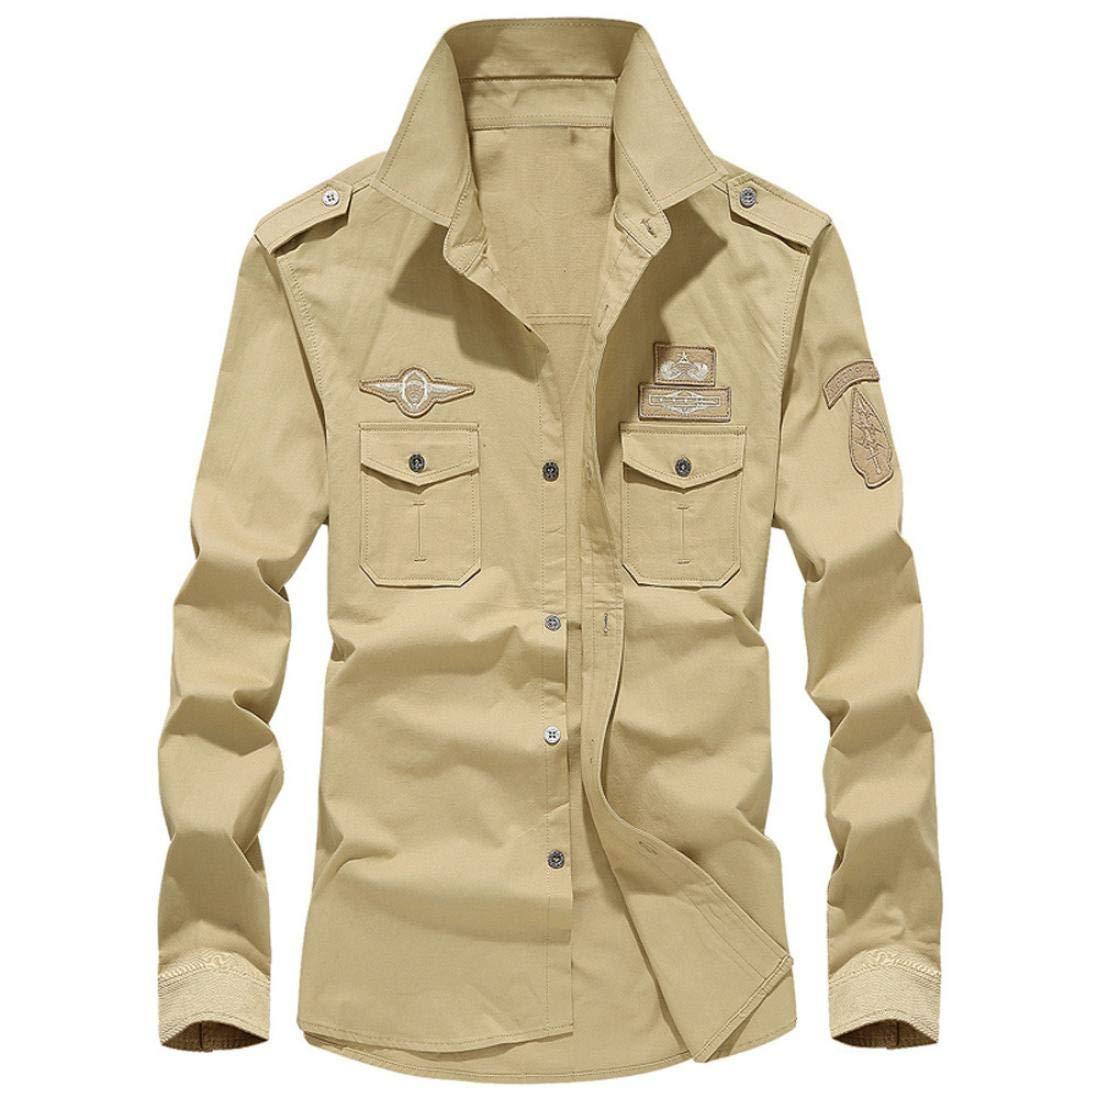 MRULIC Herren Herbst Militär Slim Button Langarm Stehkragen Shirt Top MRULIC Herren Aug